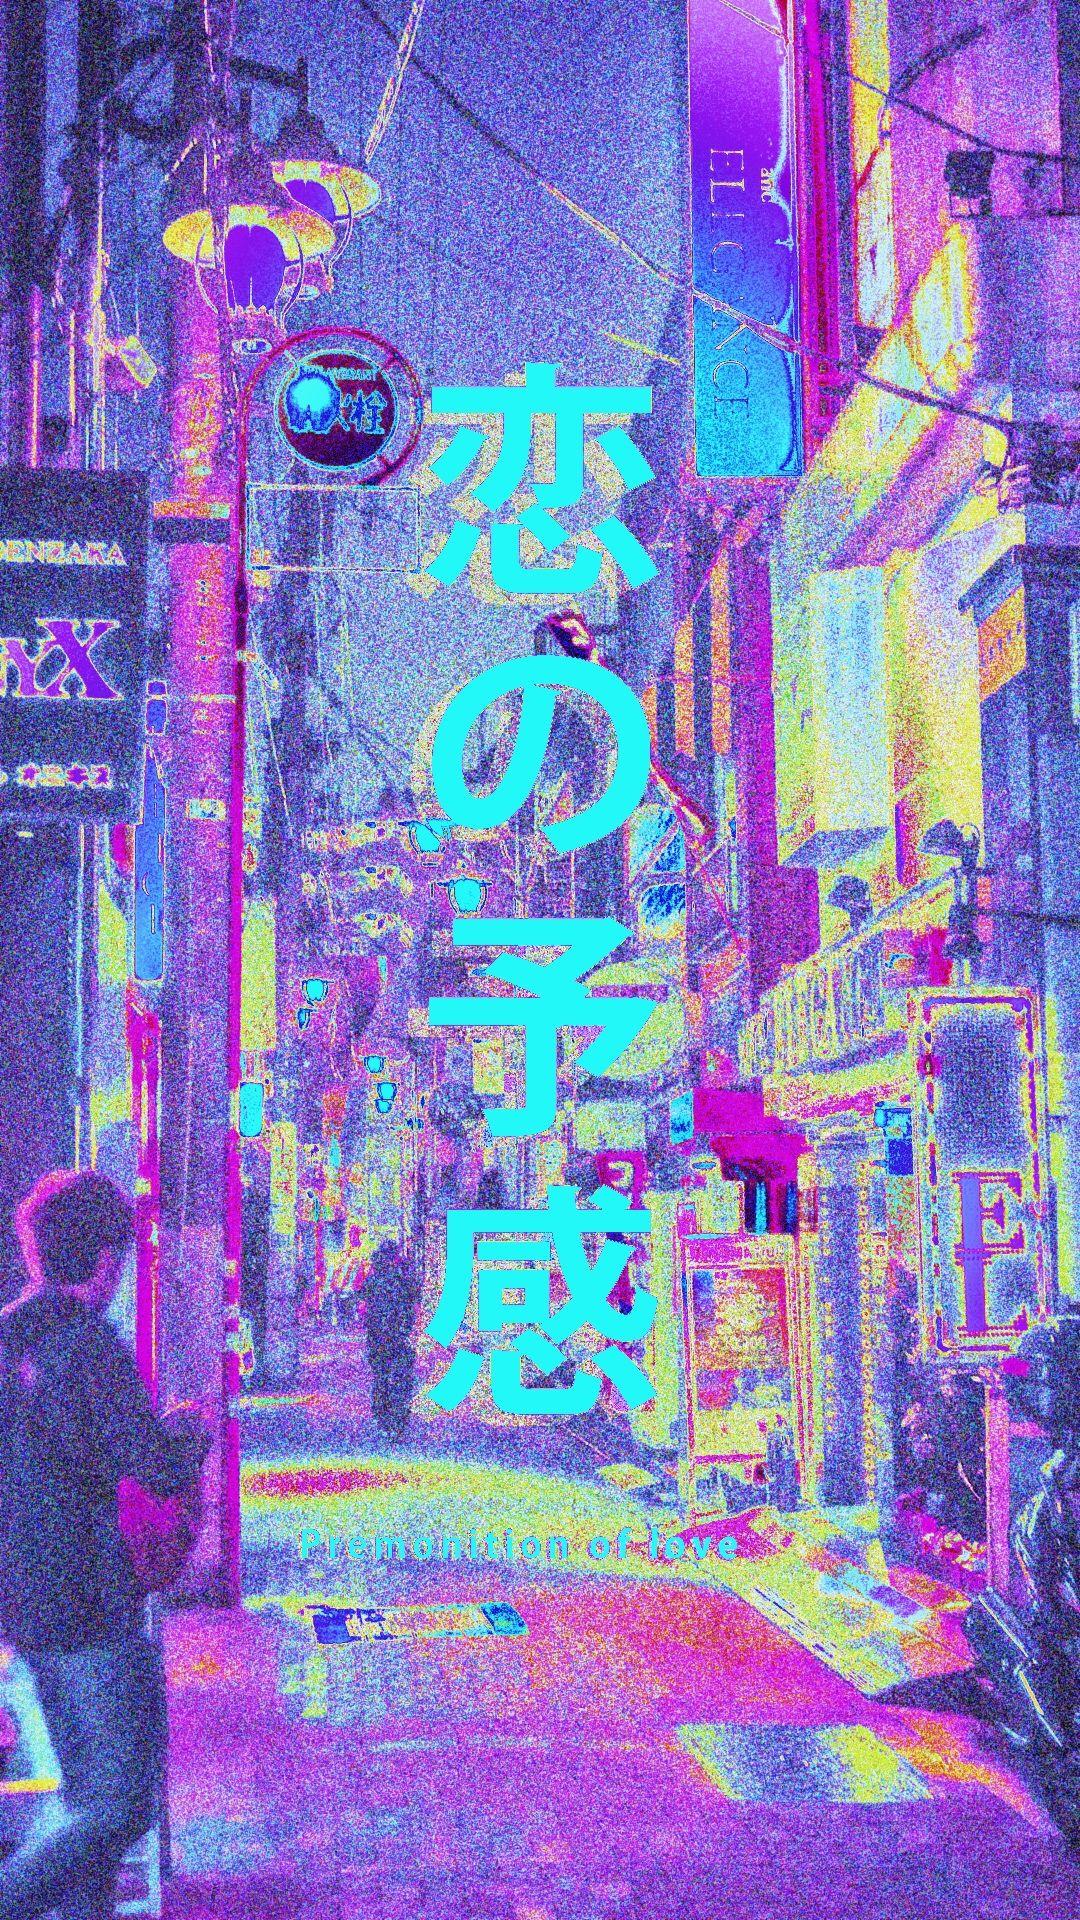 Aesthetic Vaporwave Phone Wallpapers On Wallpaperdog